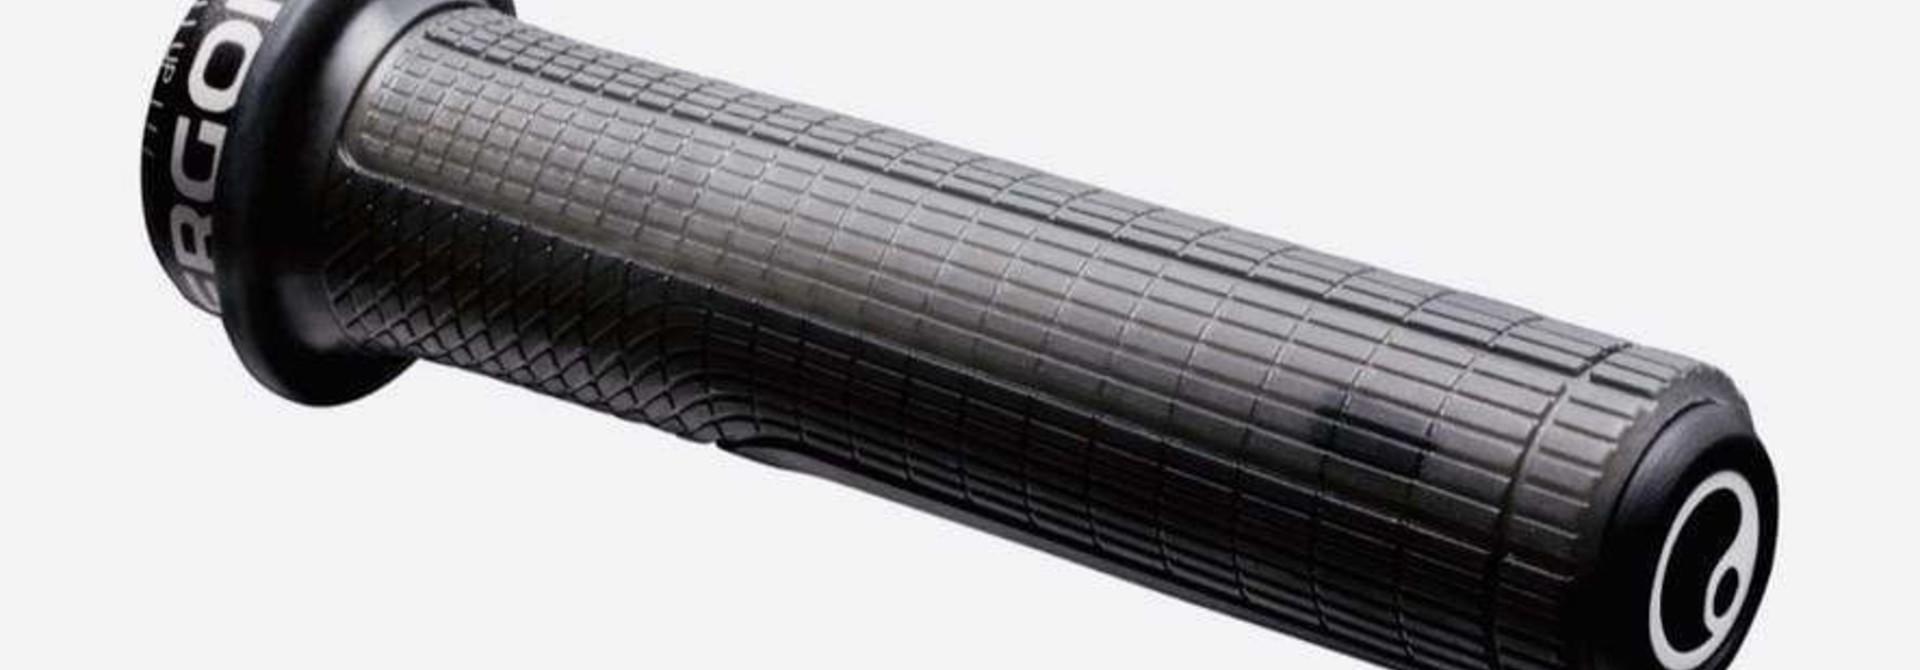 Ergon GD1 Evo Factory Slim Grips - Frozen Stealth, Lock-On